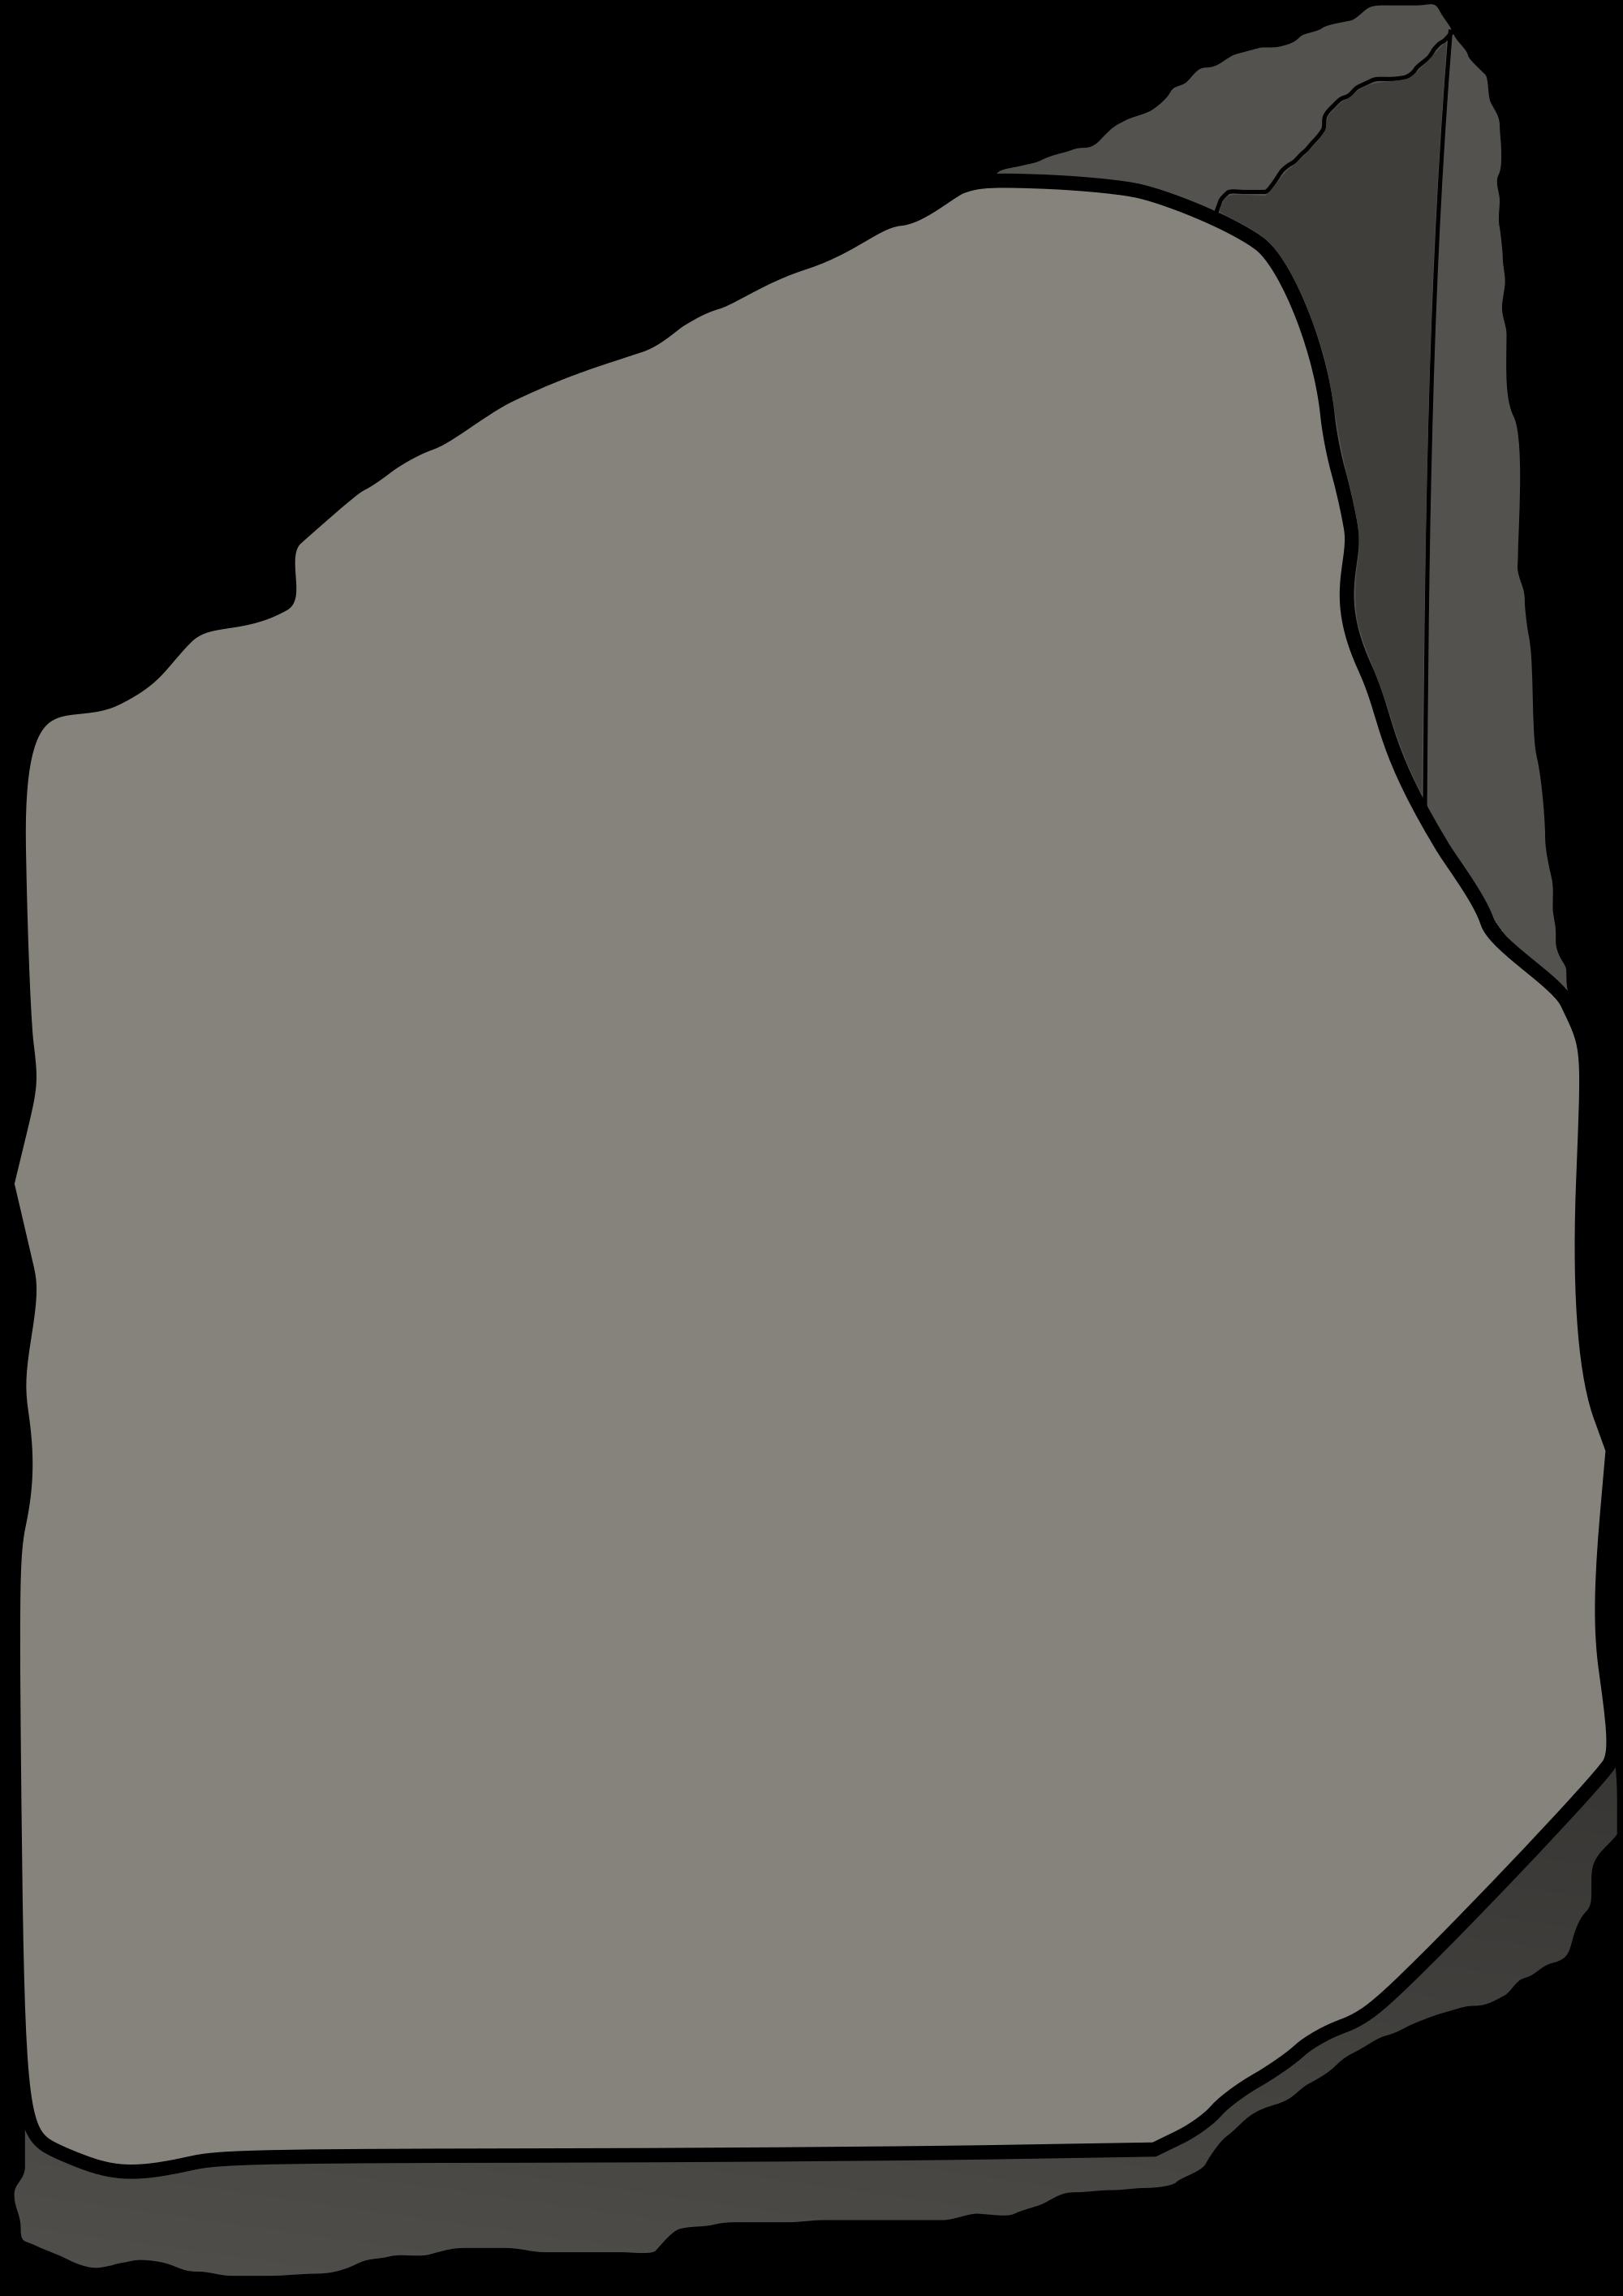 File:Rosetta Stone stone.svg.